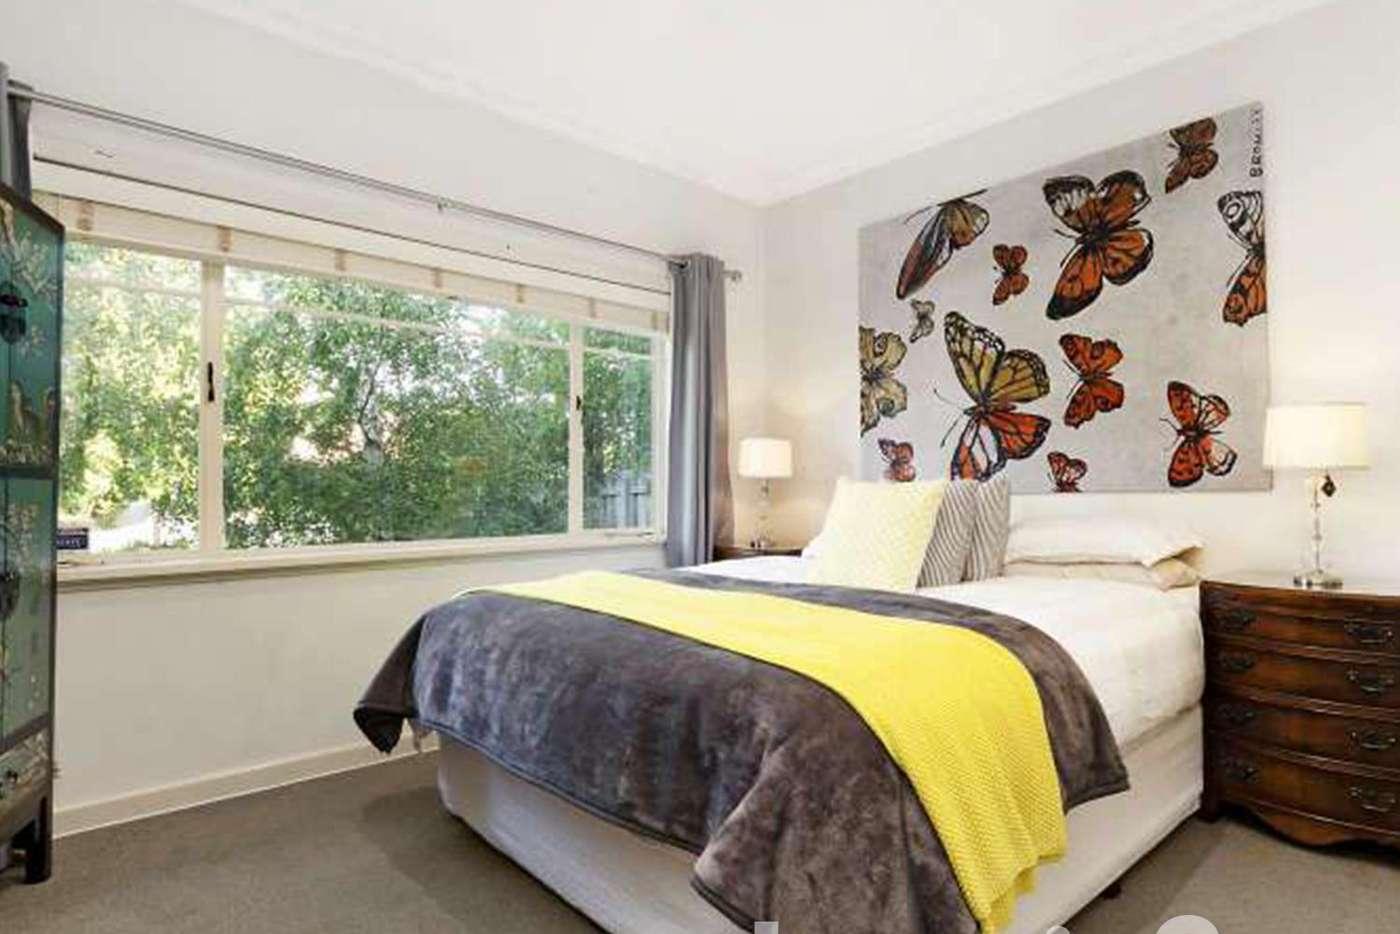 Sixth view of Homely house listing, 31 Highbury Avenue, Hampton East VIC 3188